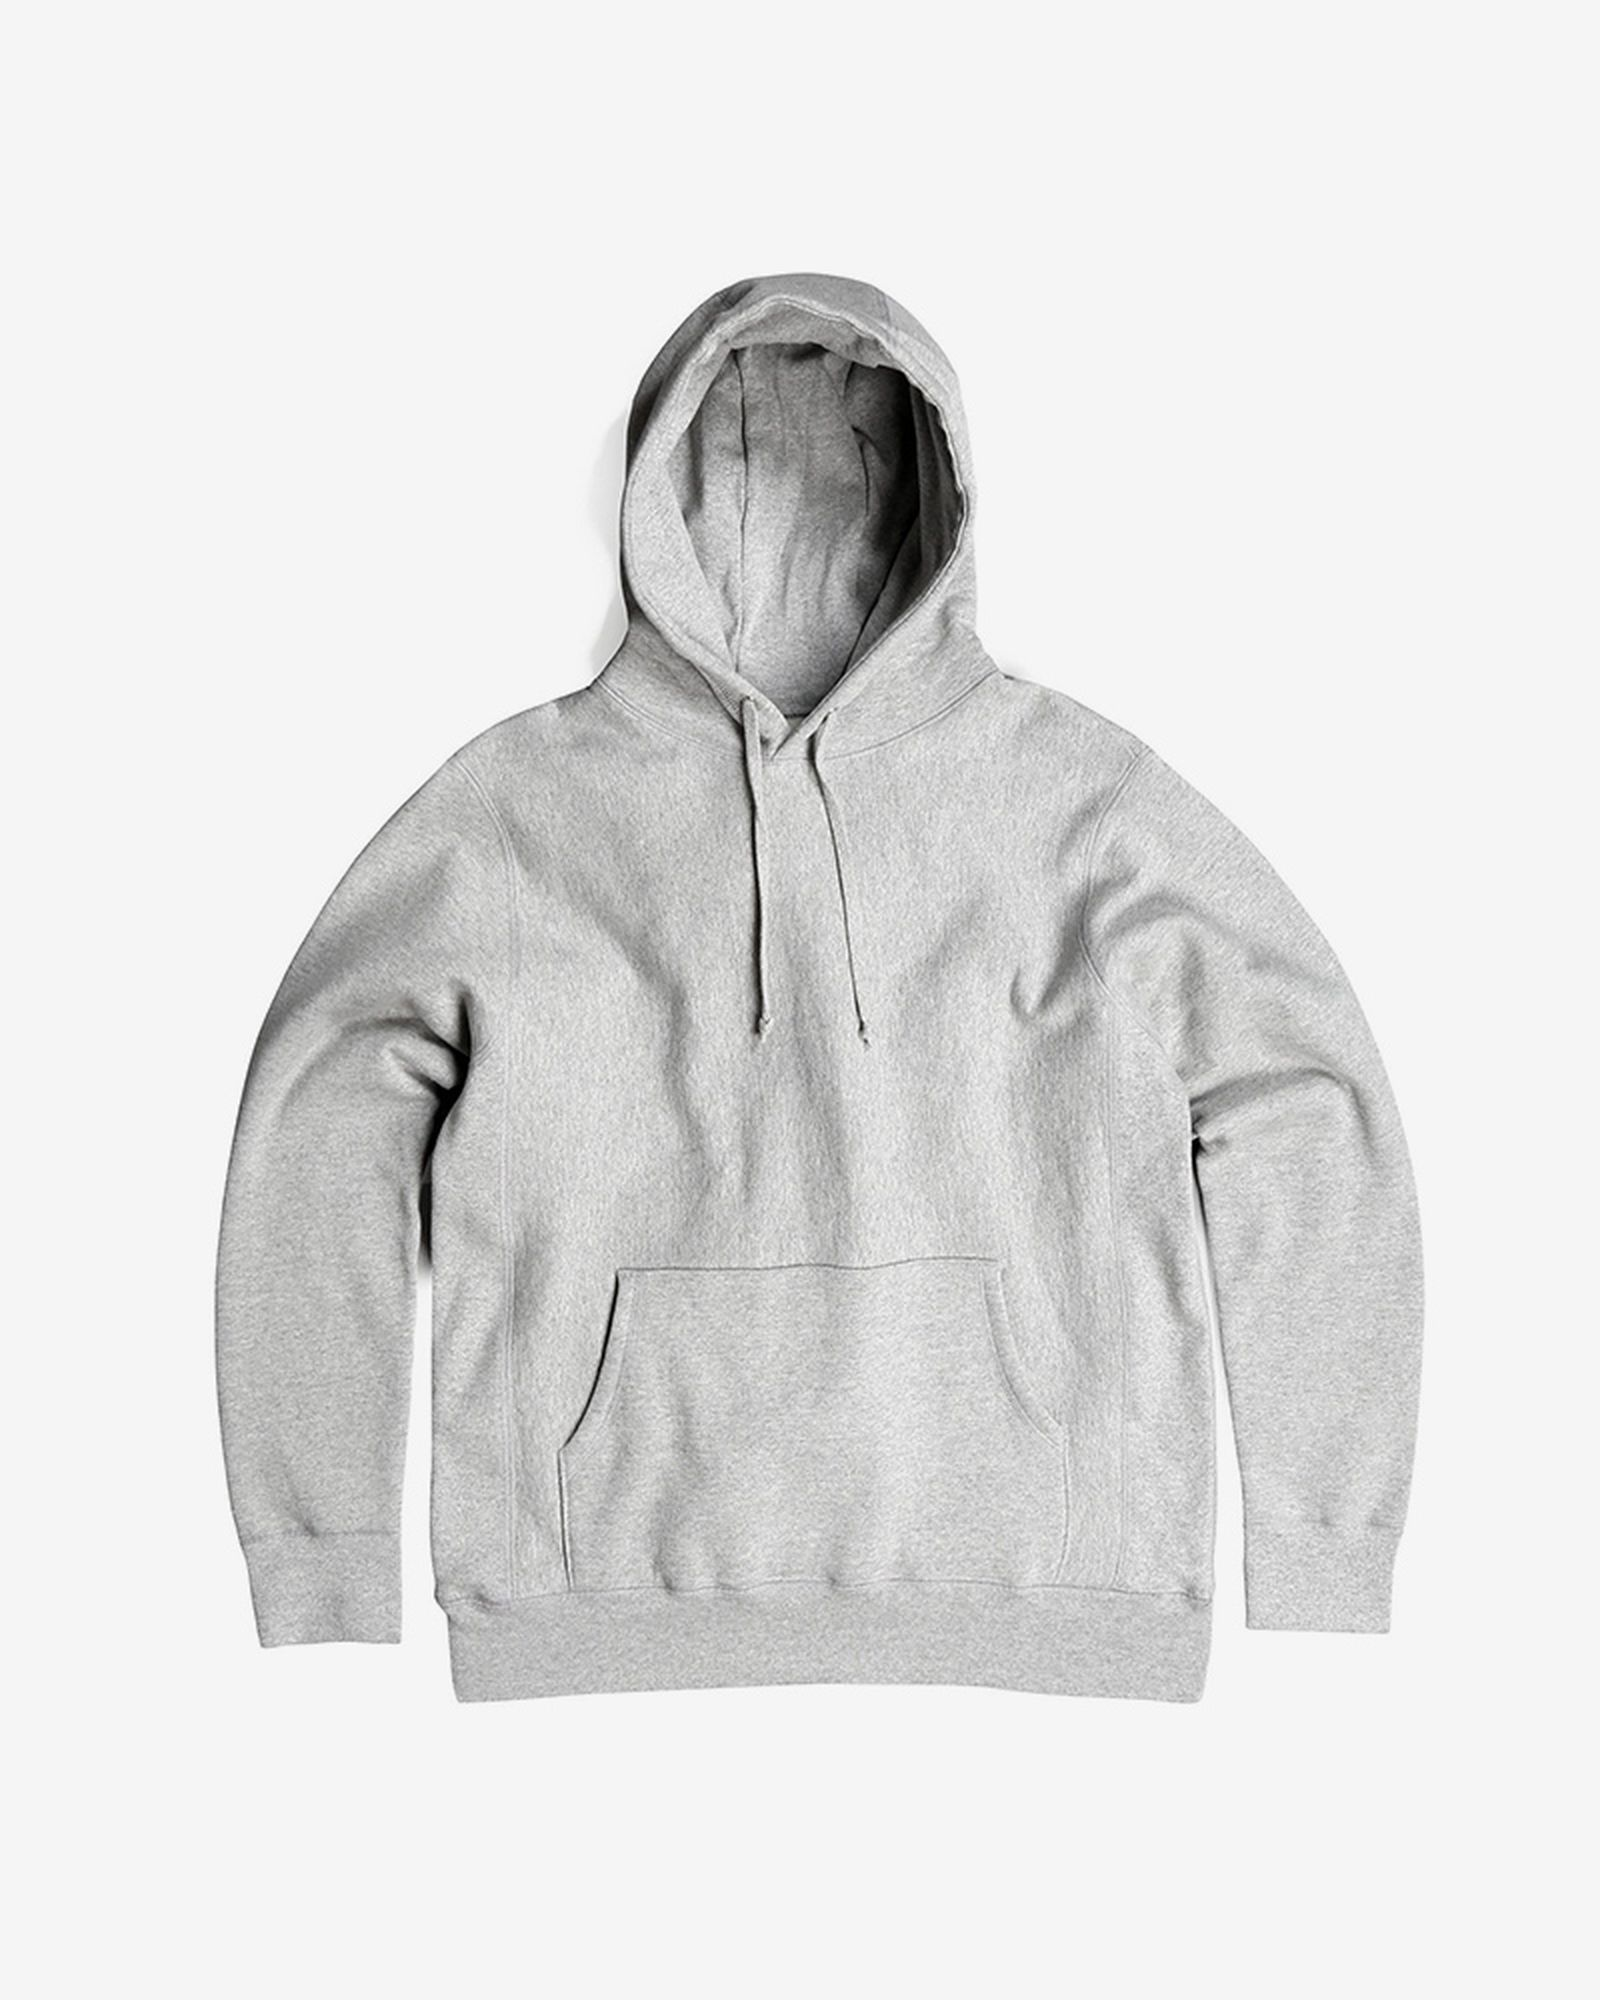 best-blank-hoodies-tshirts-sweatshirts-01